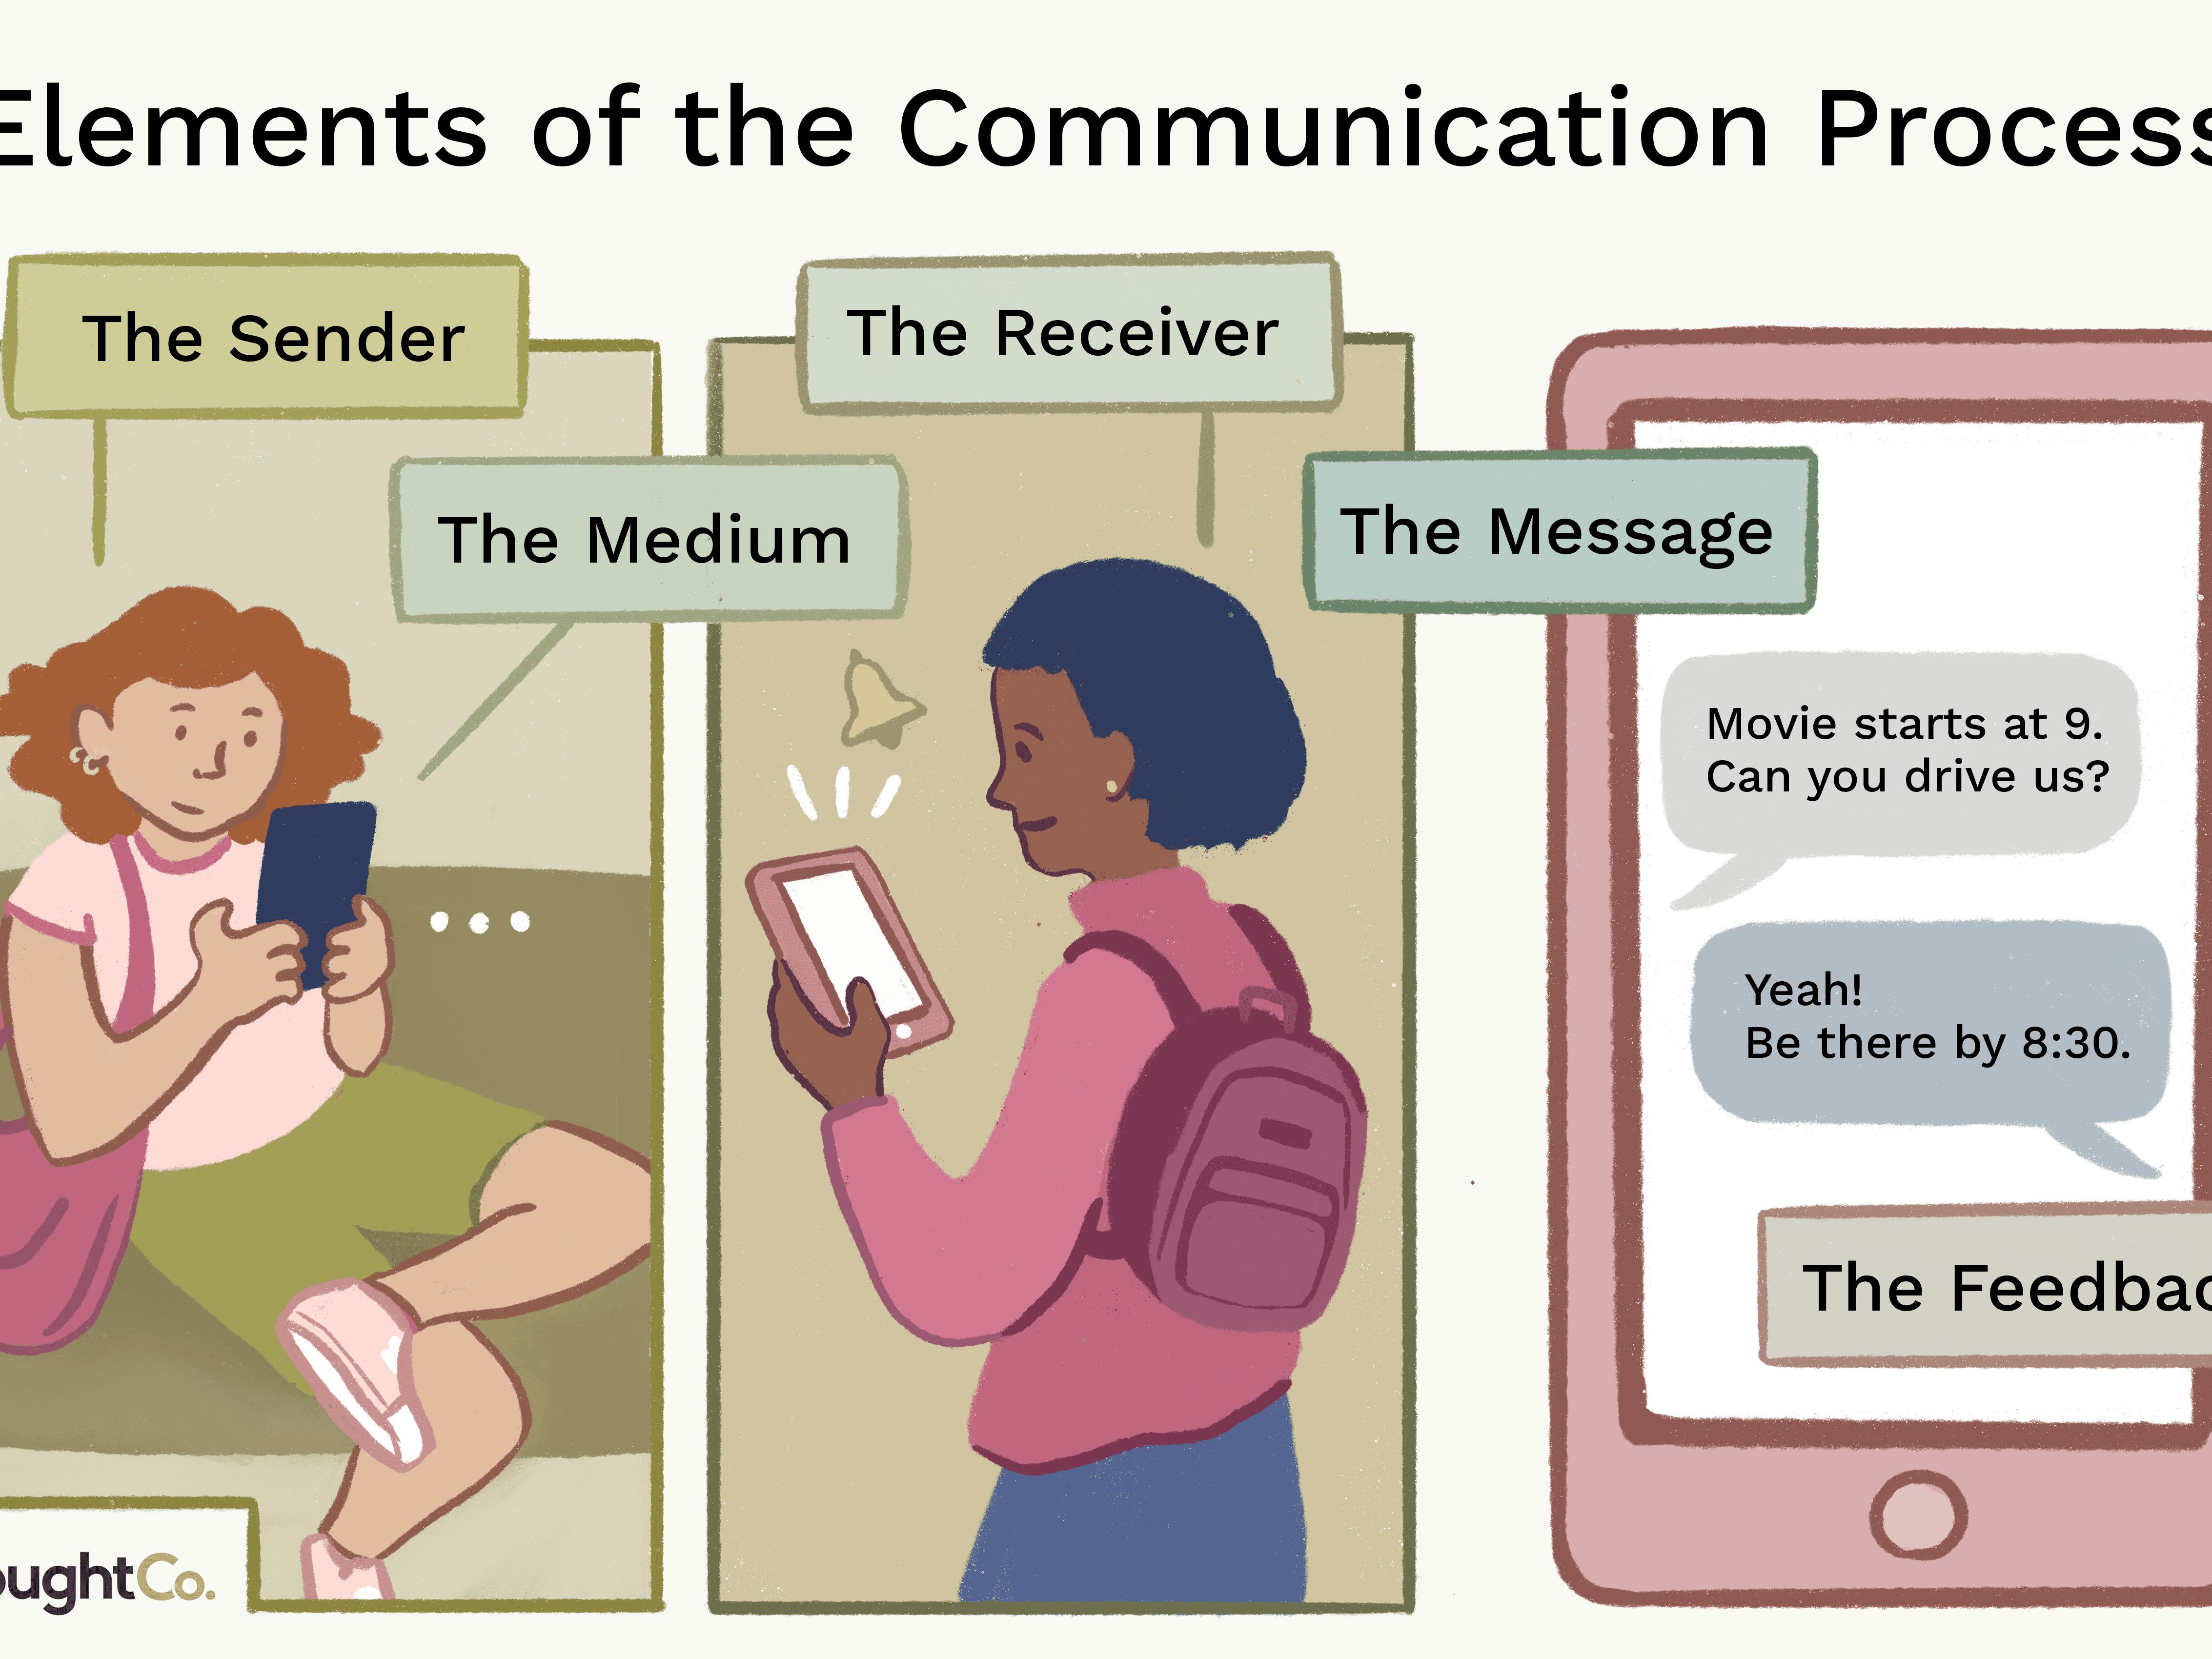 Regulae: Talk Show Script About Communication